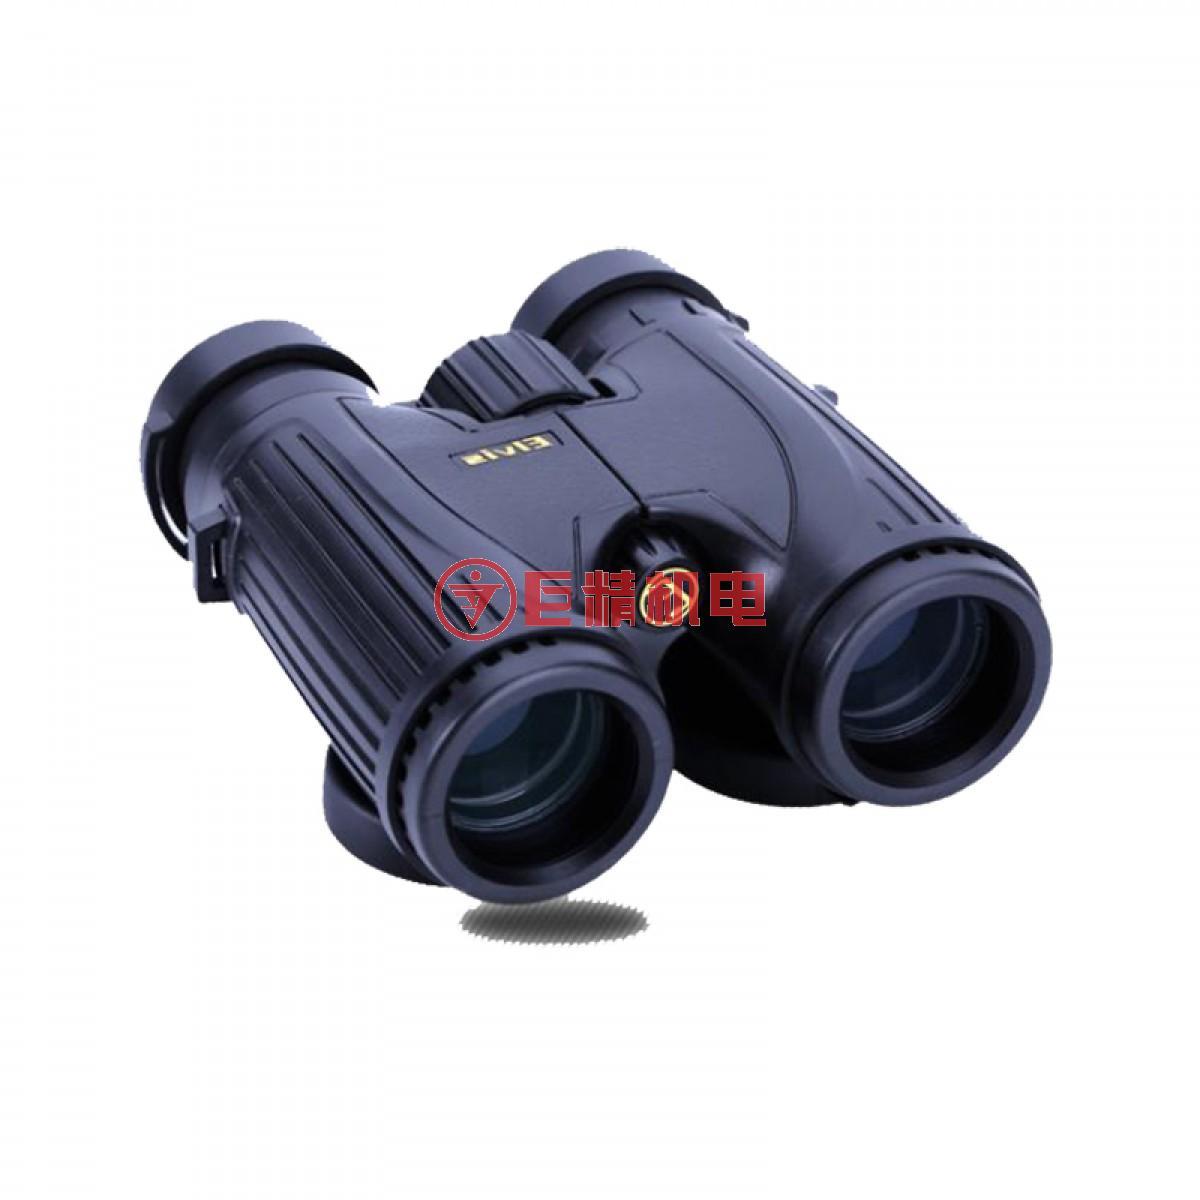 Elvis艾立仕 Zeugen目击者 HA8X32户外双筒望远镜生态镜片HA10X32